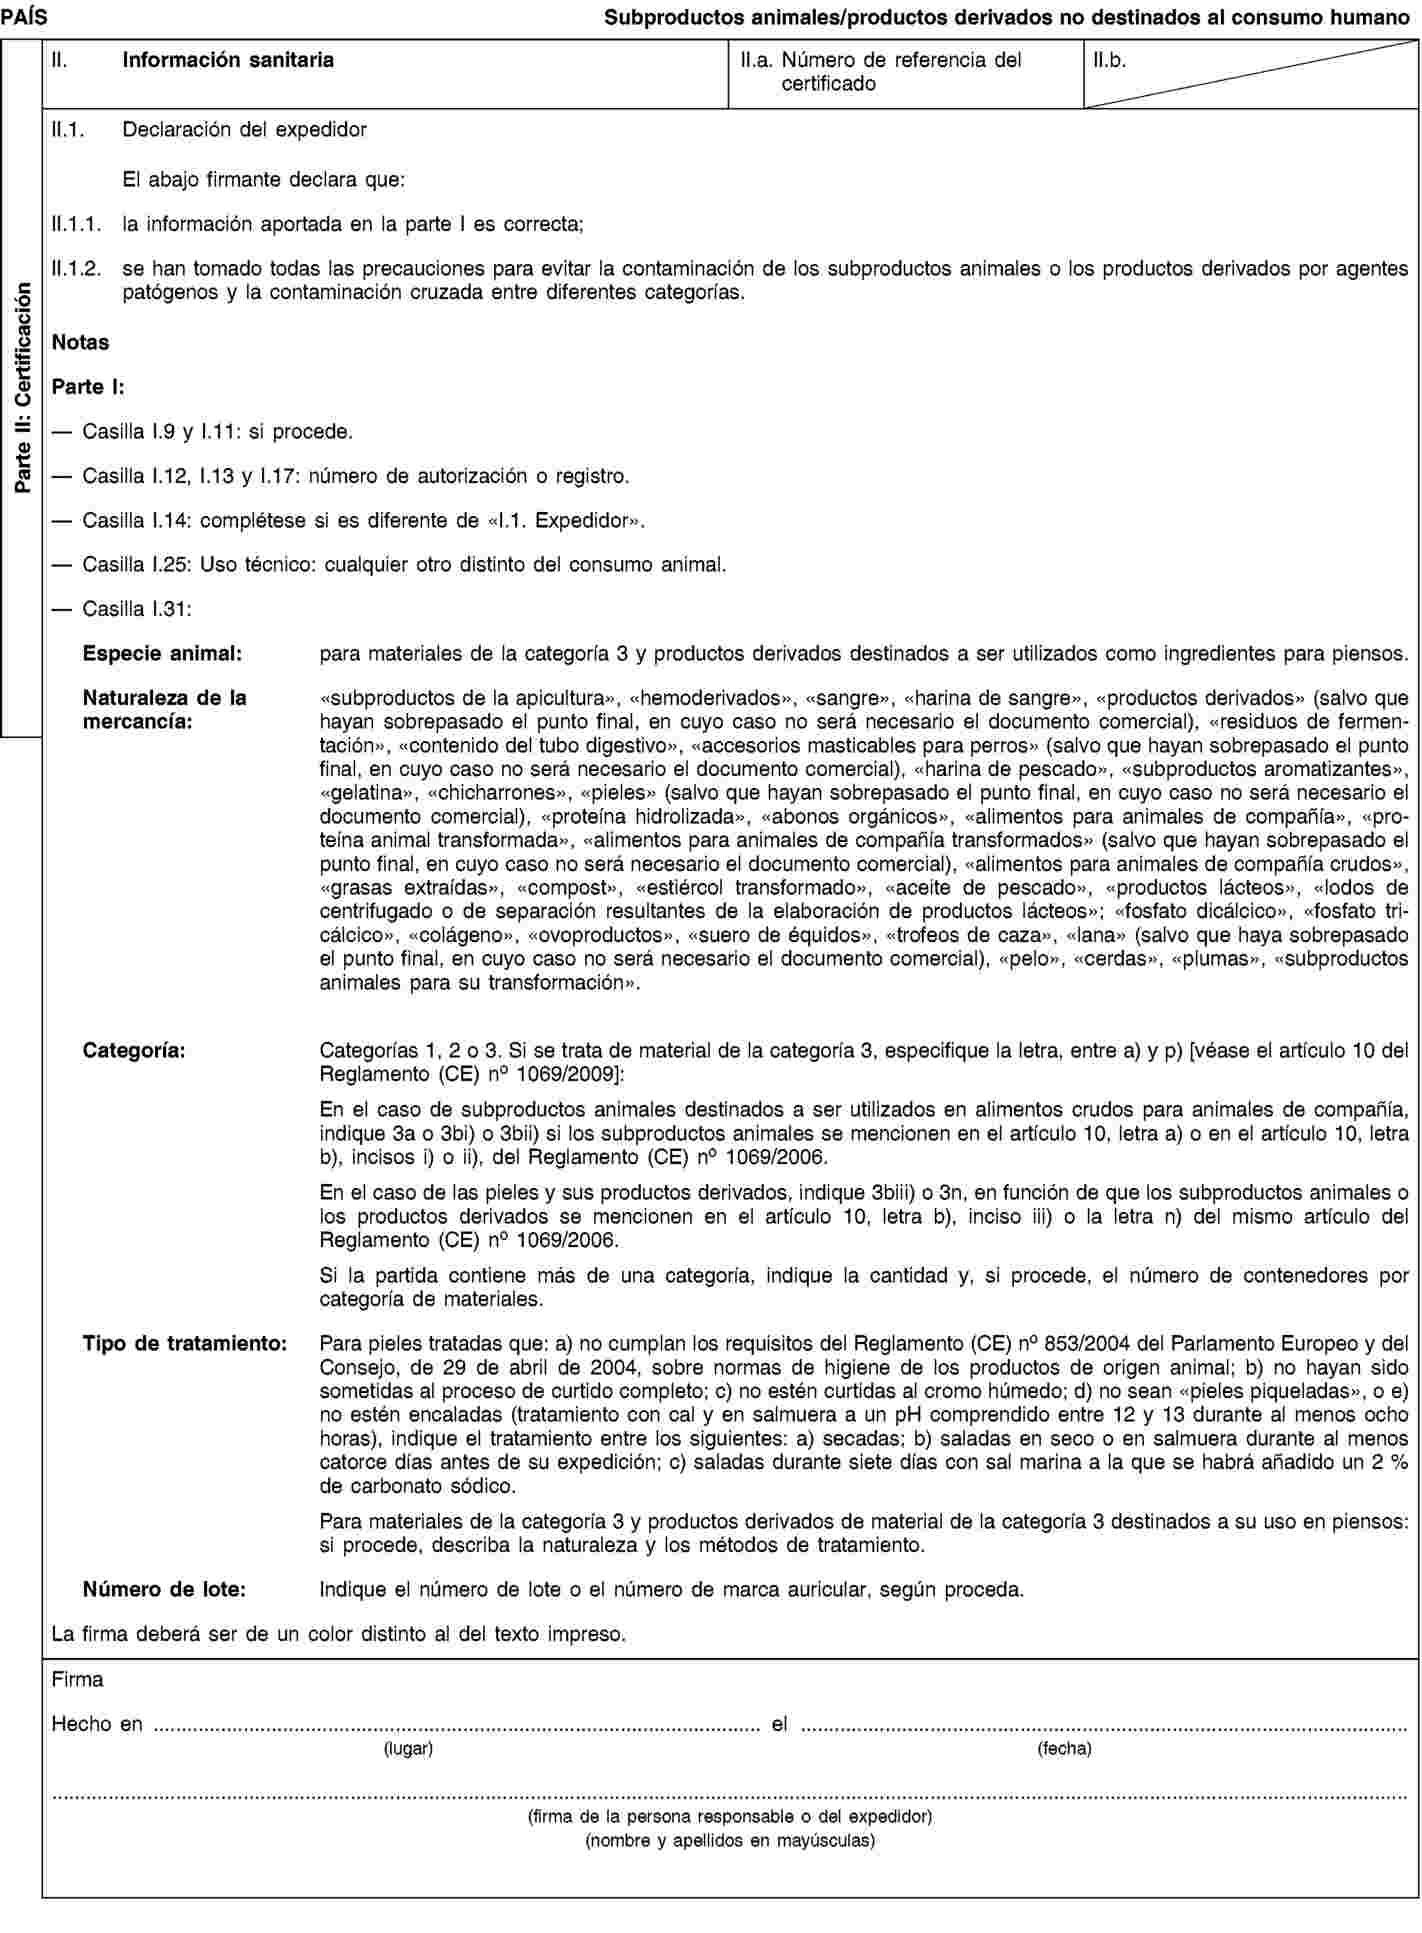 Imagen: https://eur-lex.europa.eu/resource.html?uri=uriserv:OJ.L_.2011.054.01.0001.01.SPA.xhtml.L_2011054ES.01005901.tif.jpg